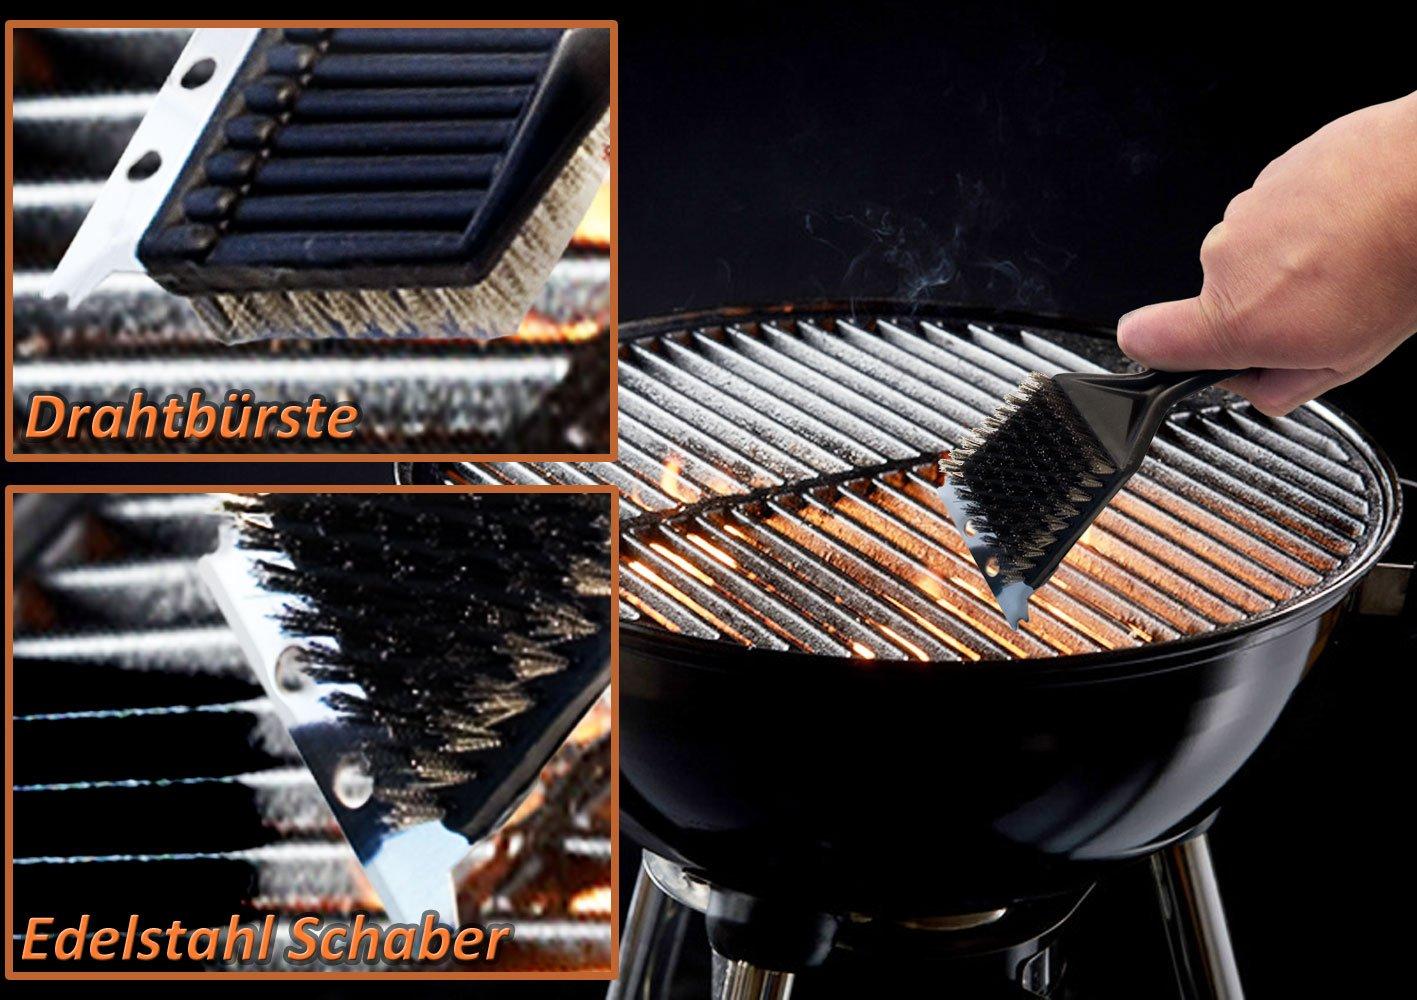 Outdoor Küche Edelstahl Xxl : Hometools eu profi edelstahl xxl grill reinigungsbürste grill